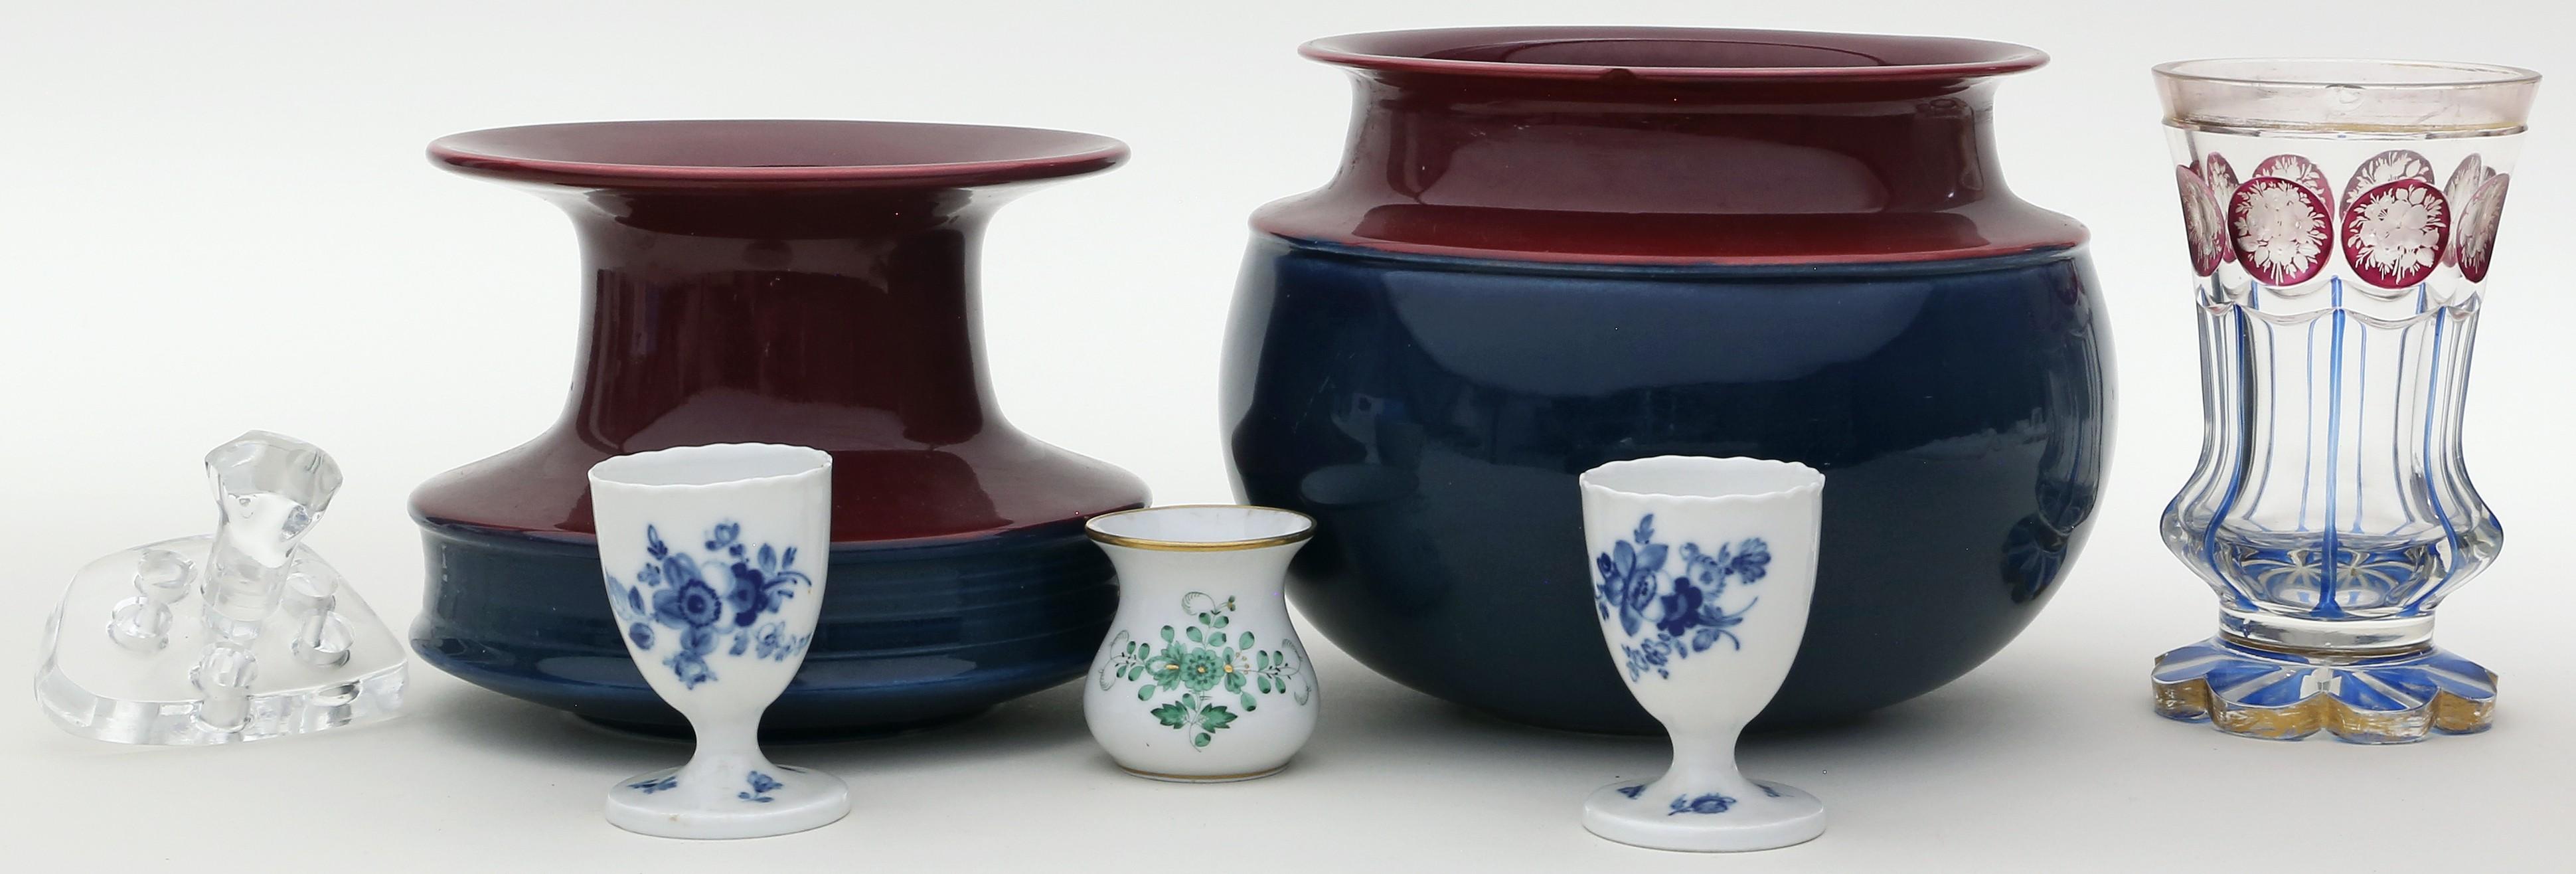 7 Teile Porzellan/Glas/Keramik: